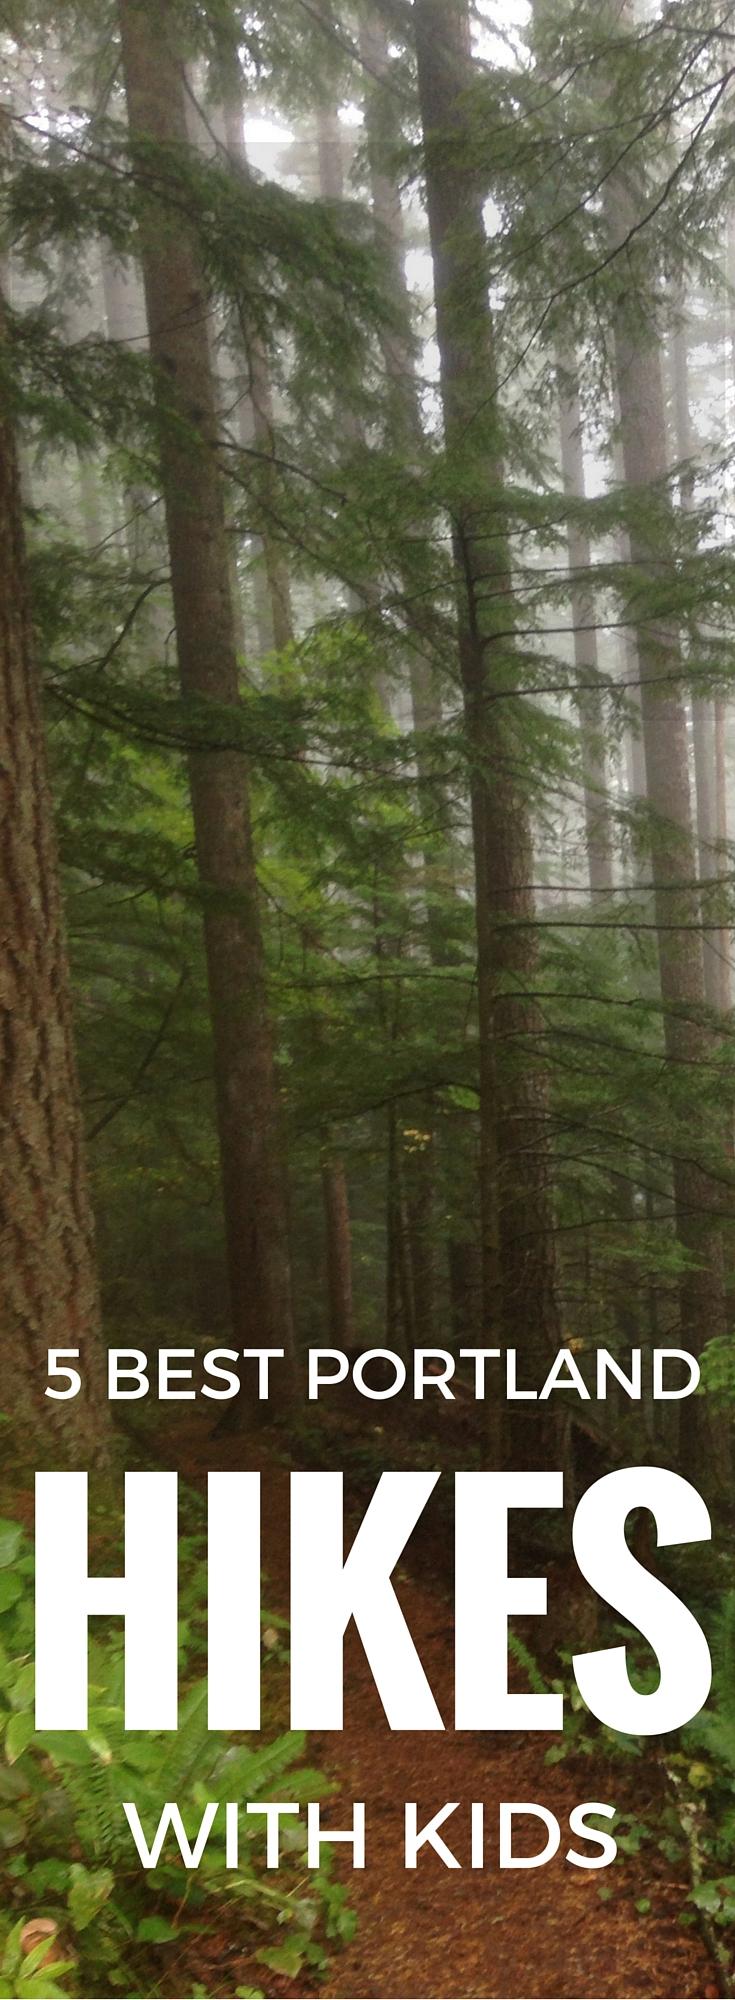 Portland-hikes-with-kids-5